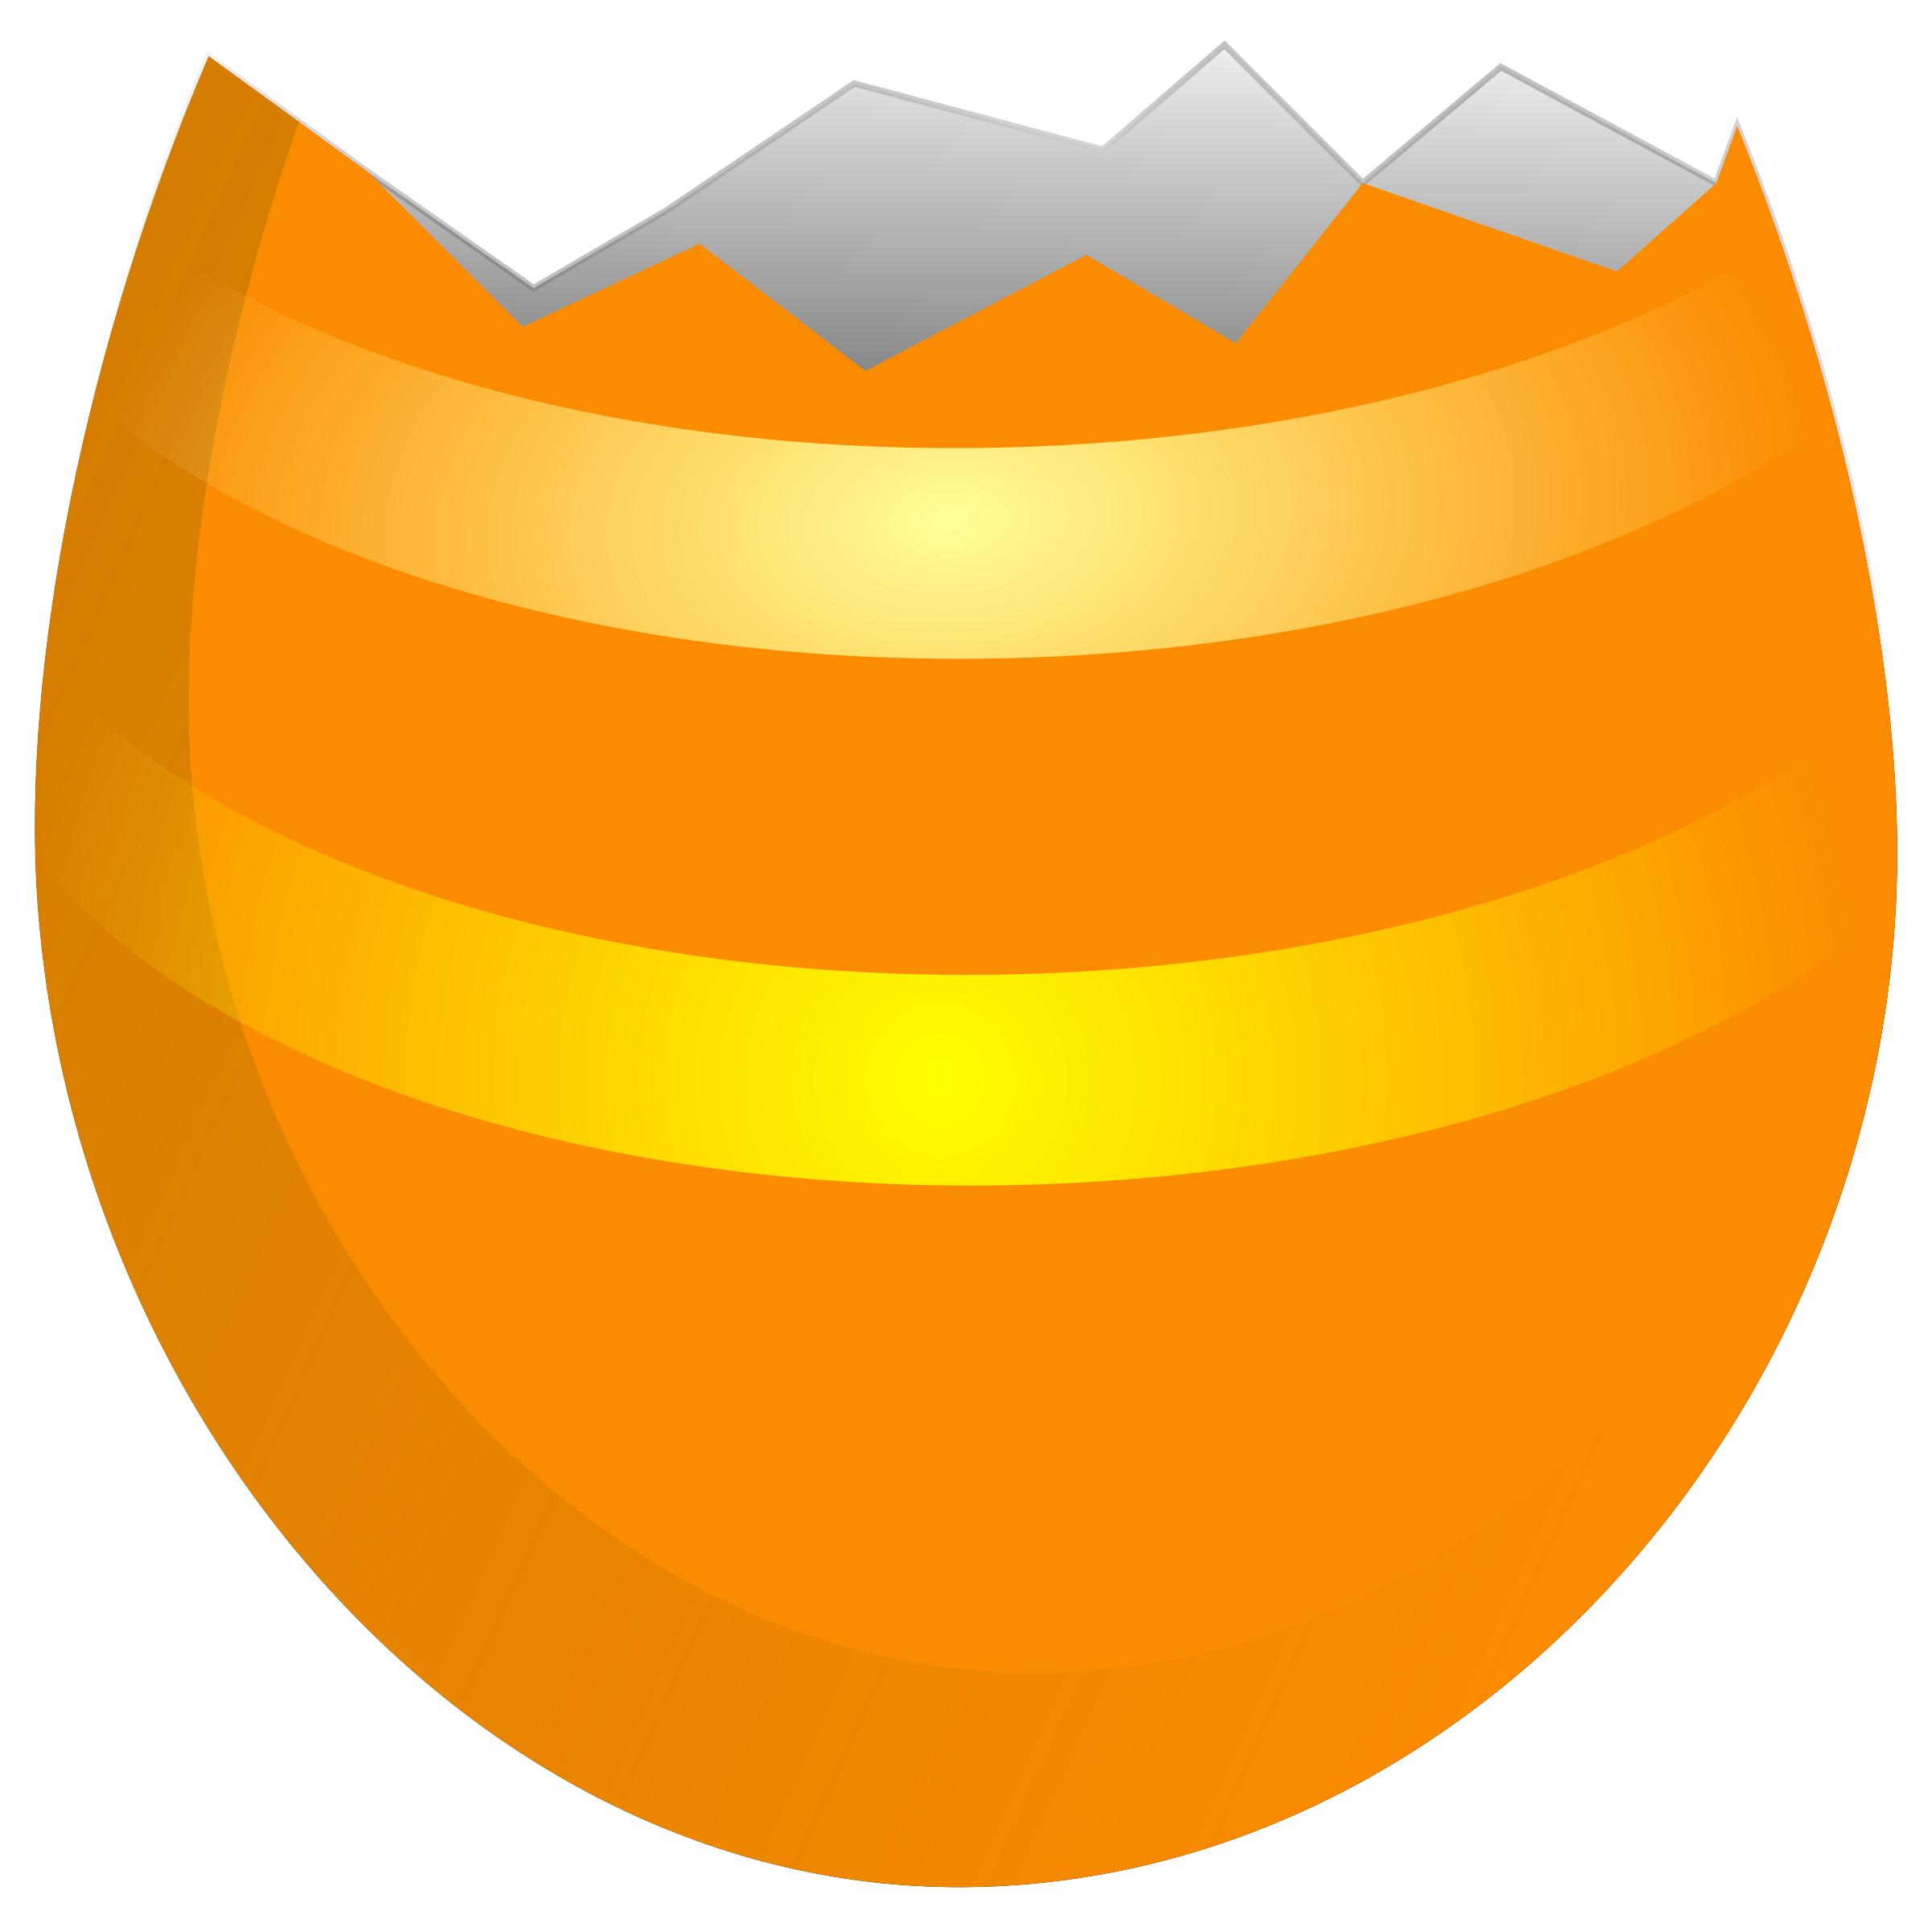 vector black and white download Cracked easter egg big. Vector cracks clipart